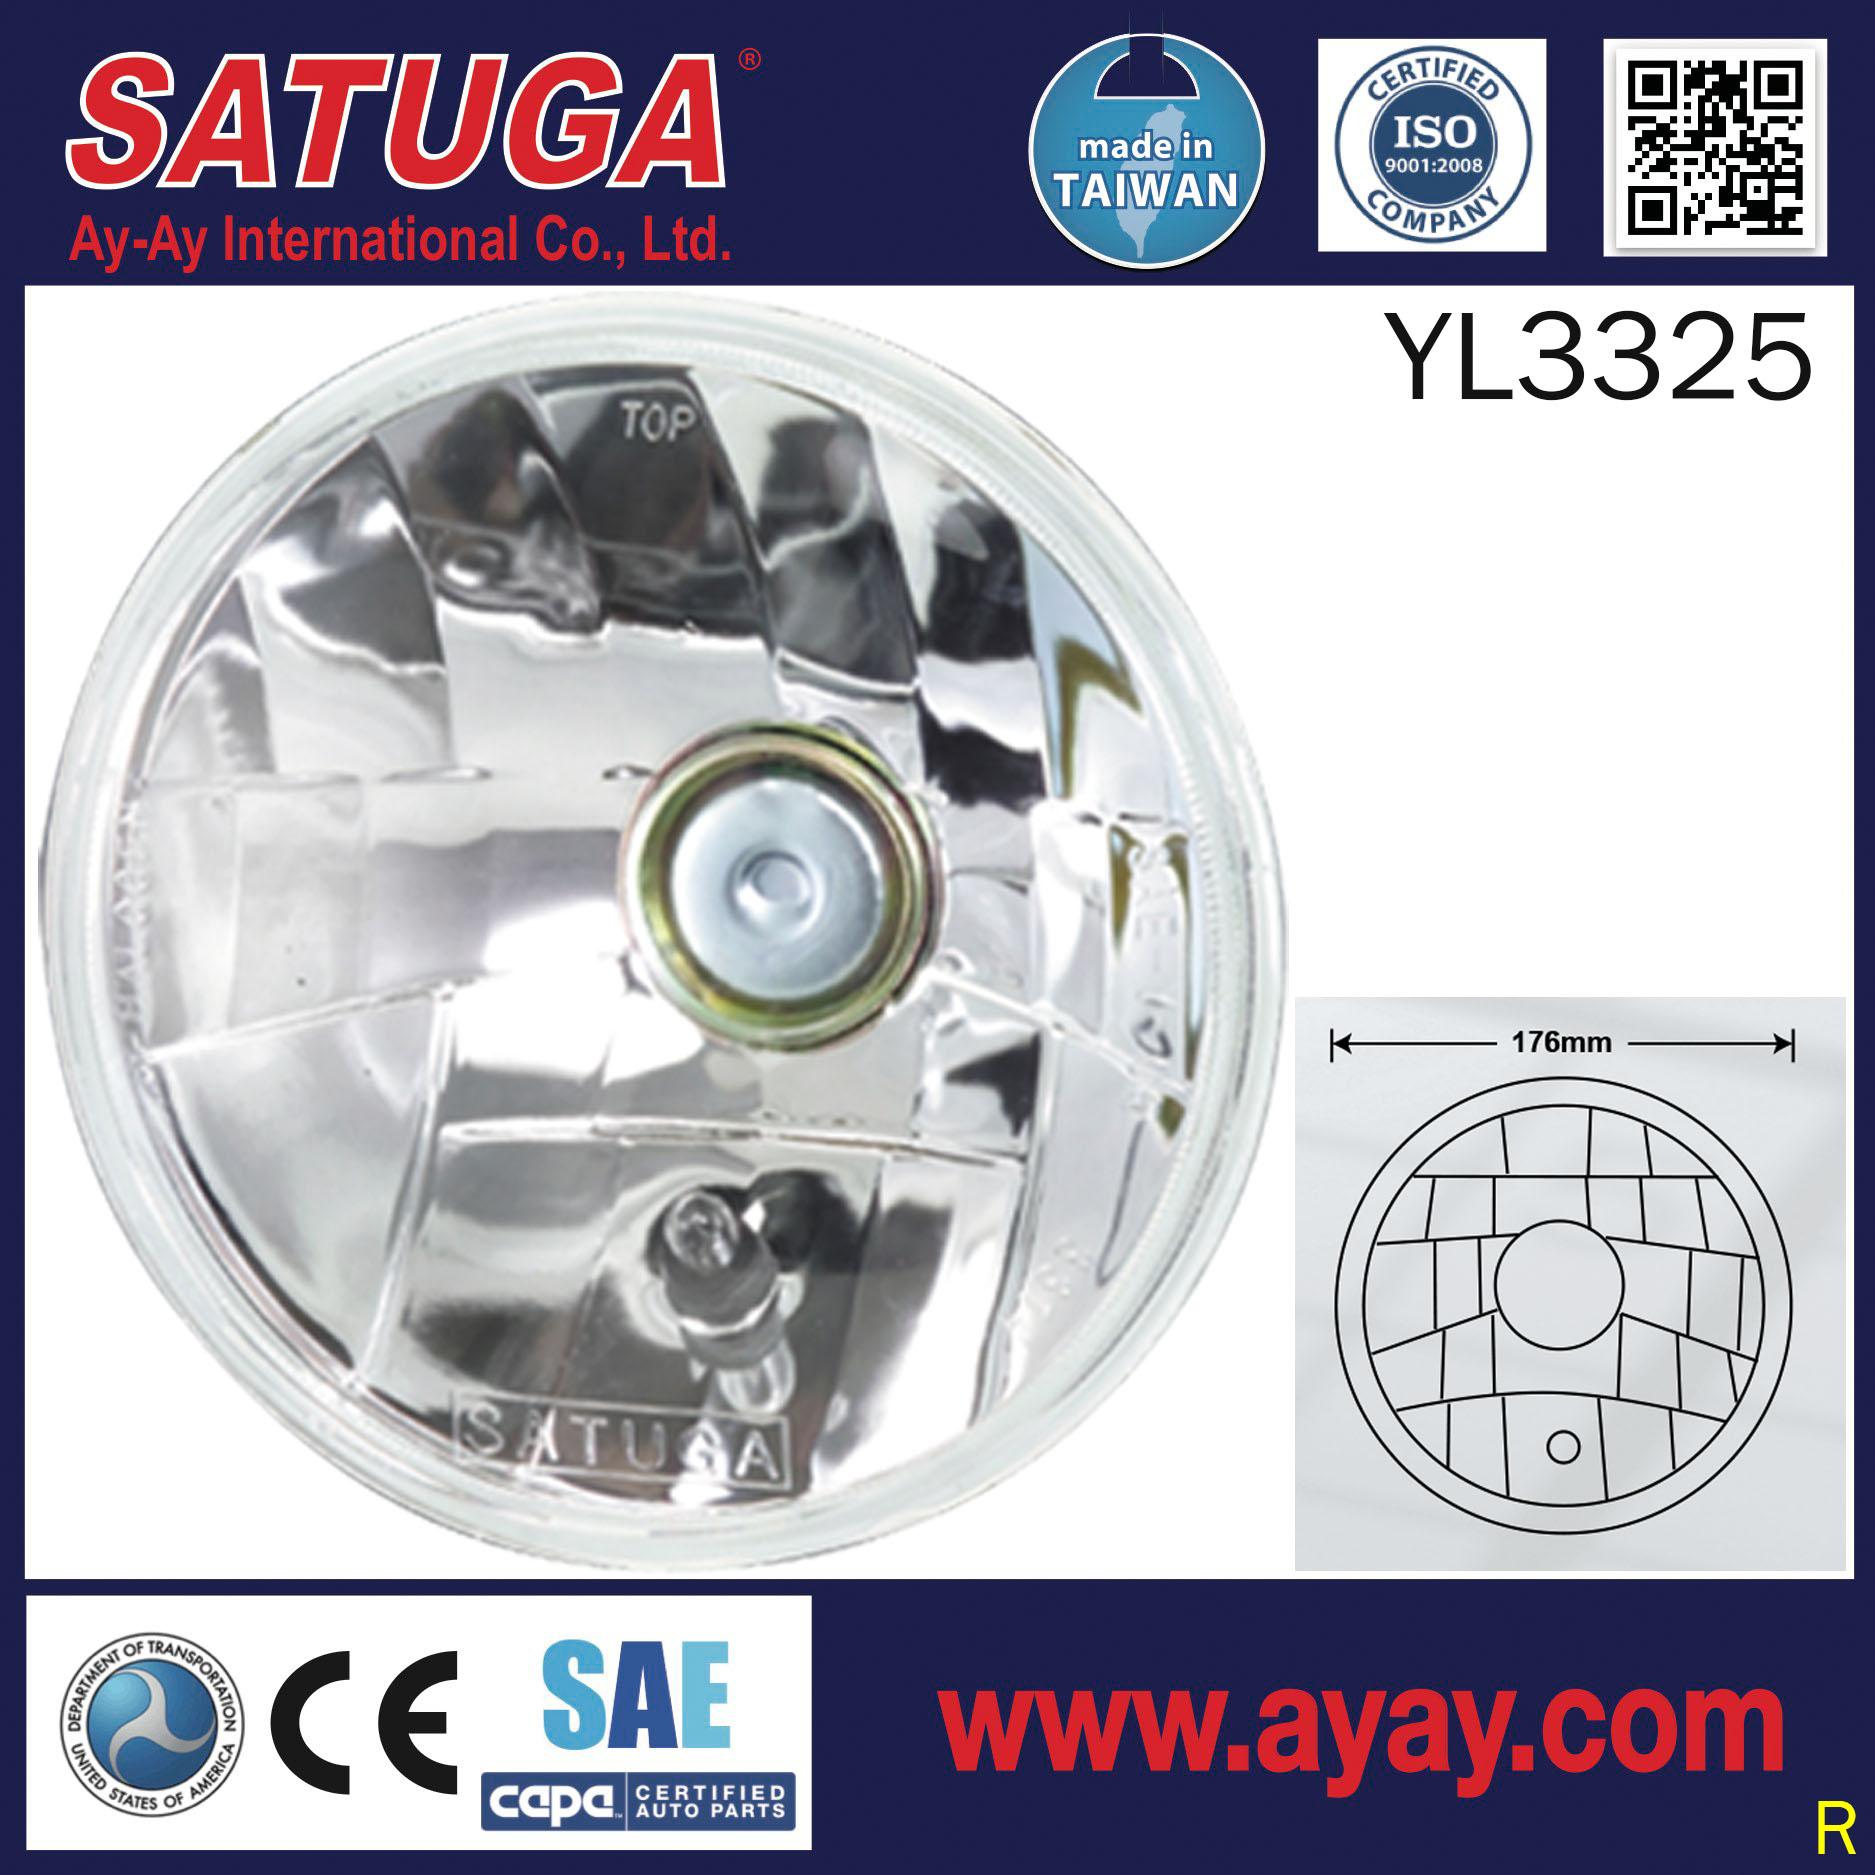 Taiwan Waterproof Headlamp Components Transportation Halogen